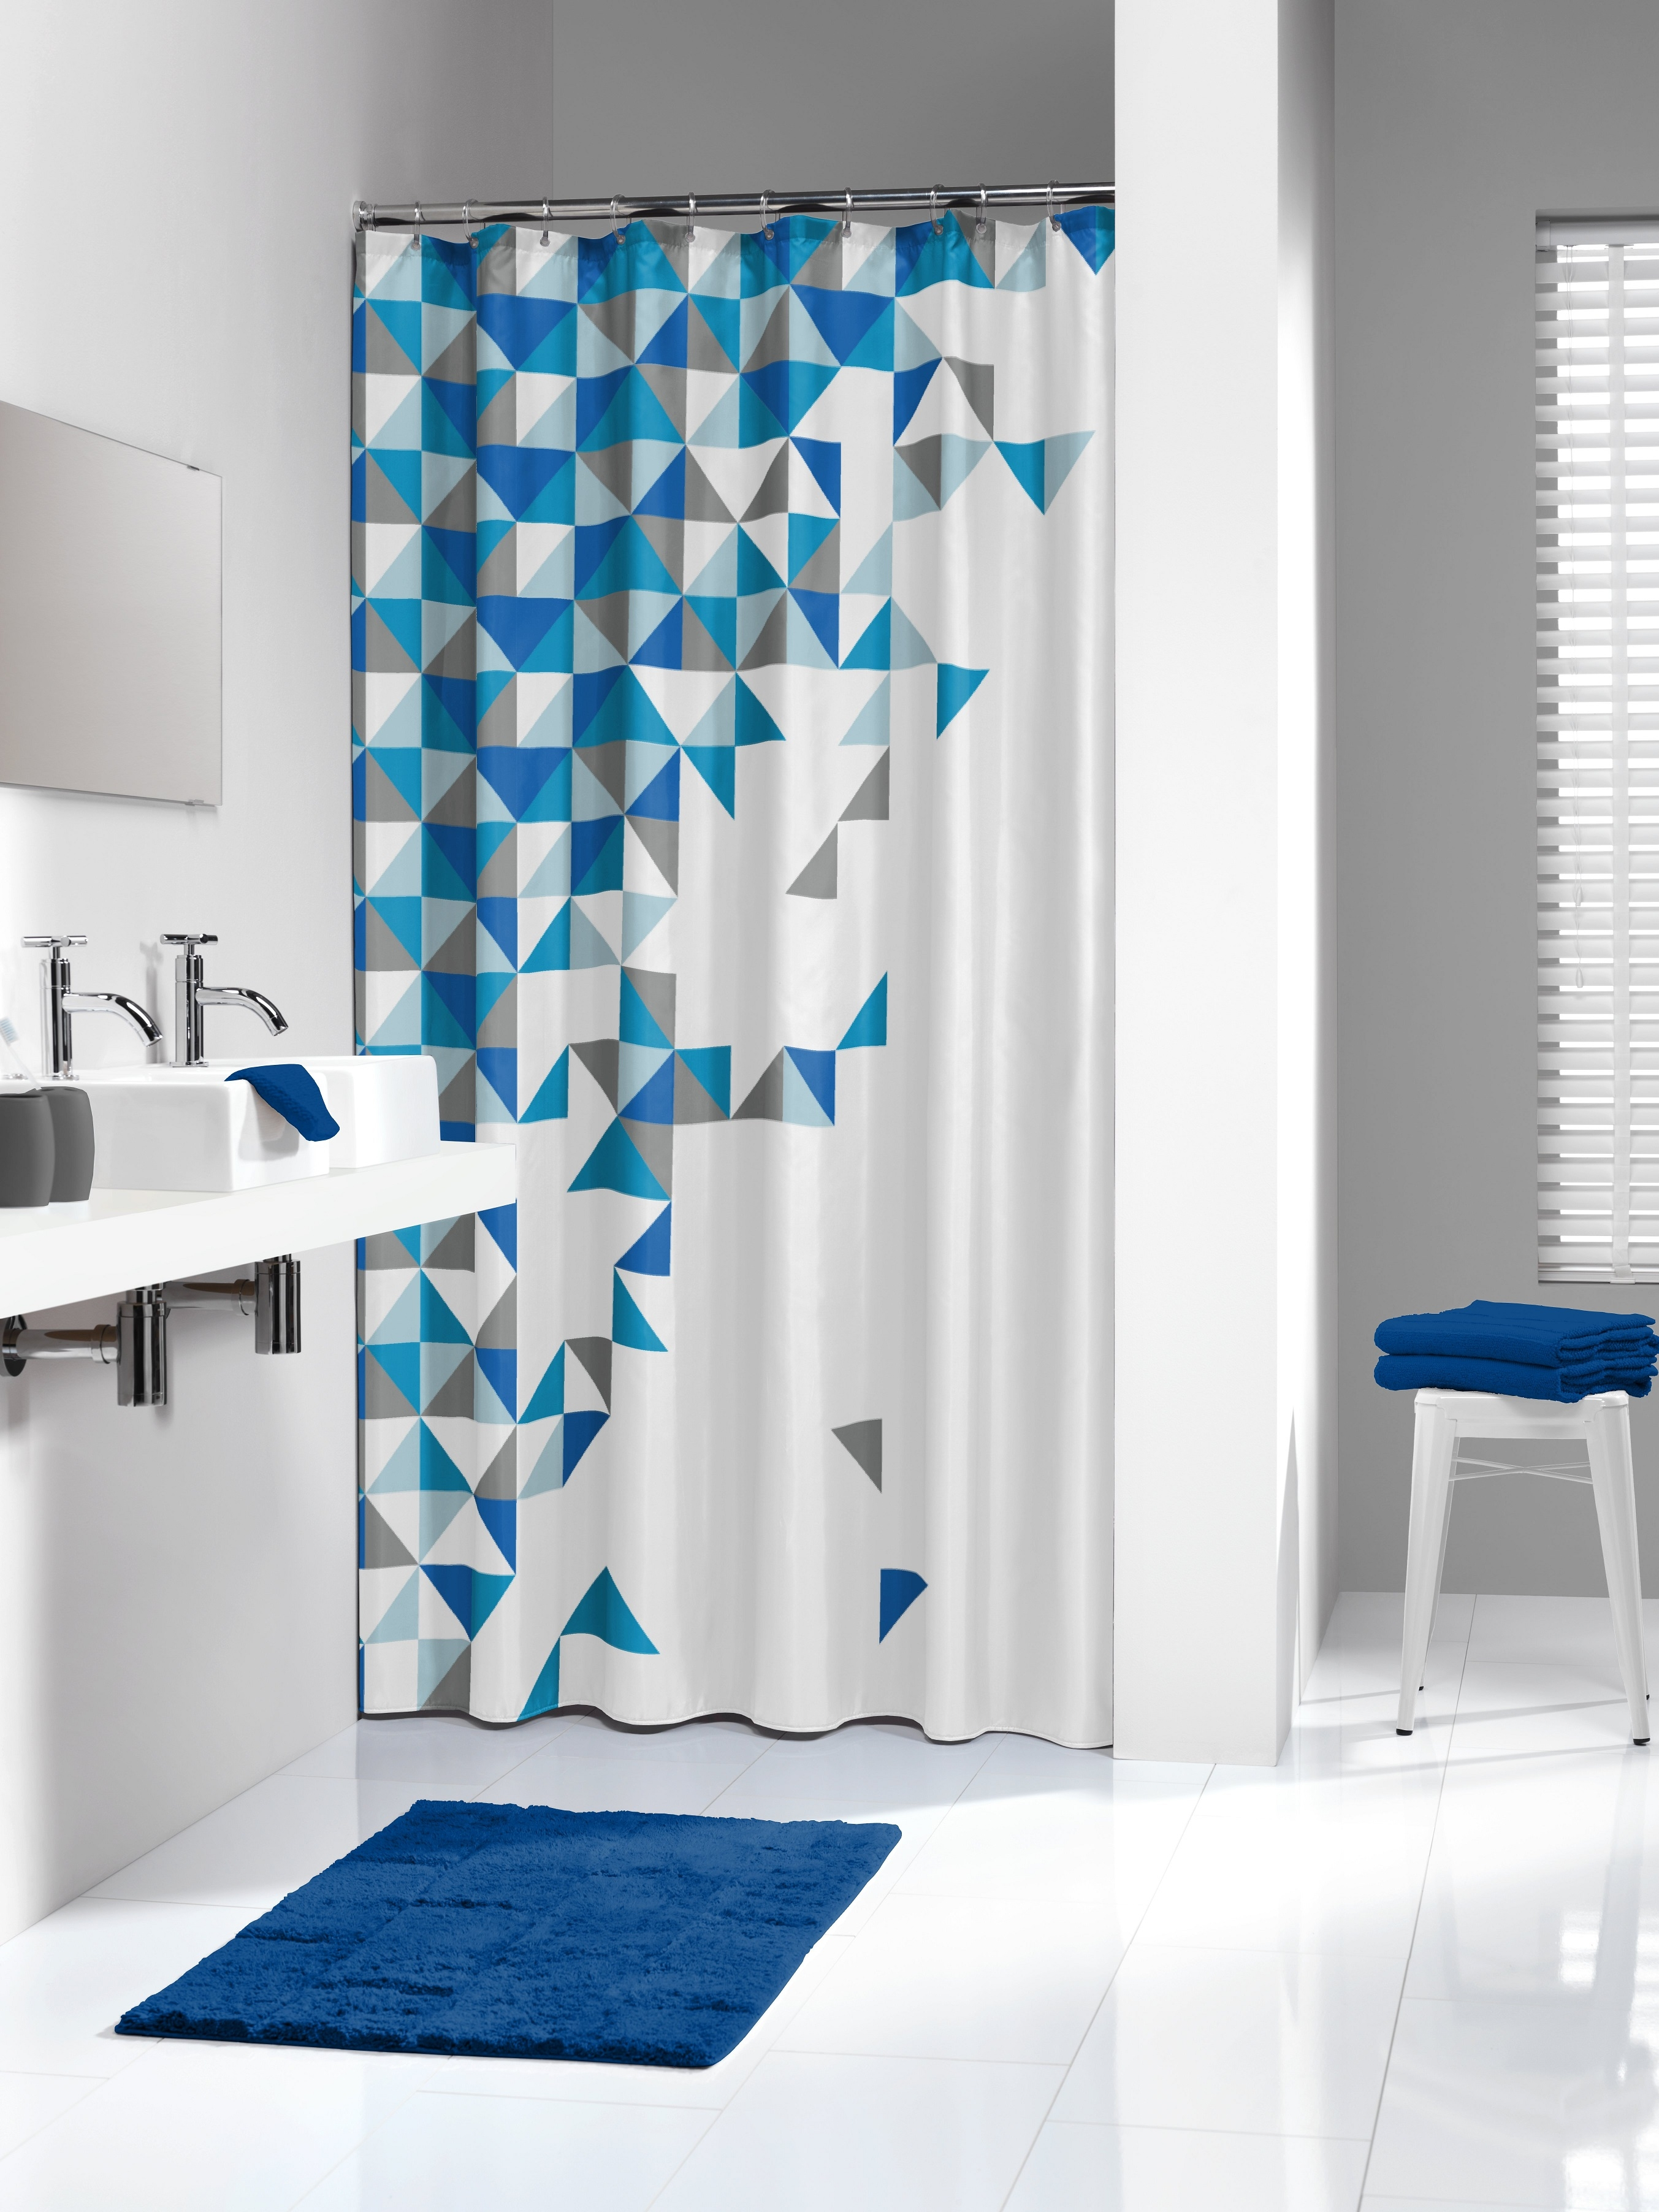 Sealskin douchegordijn Tangram 100% polyester blauw print 180x200 cm